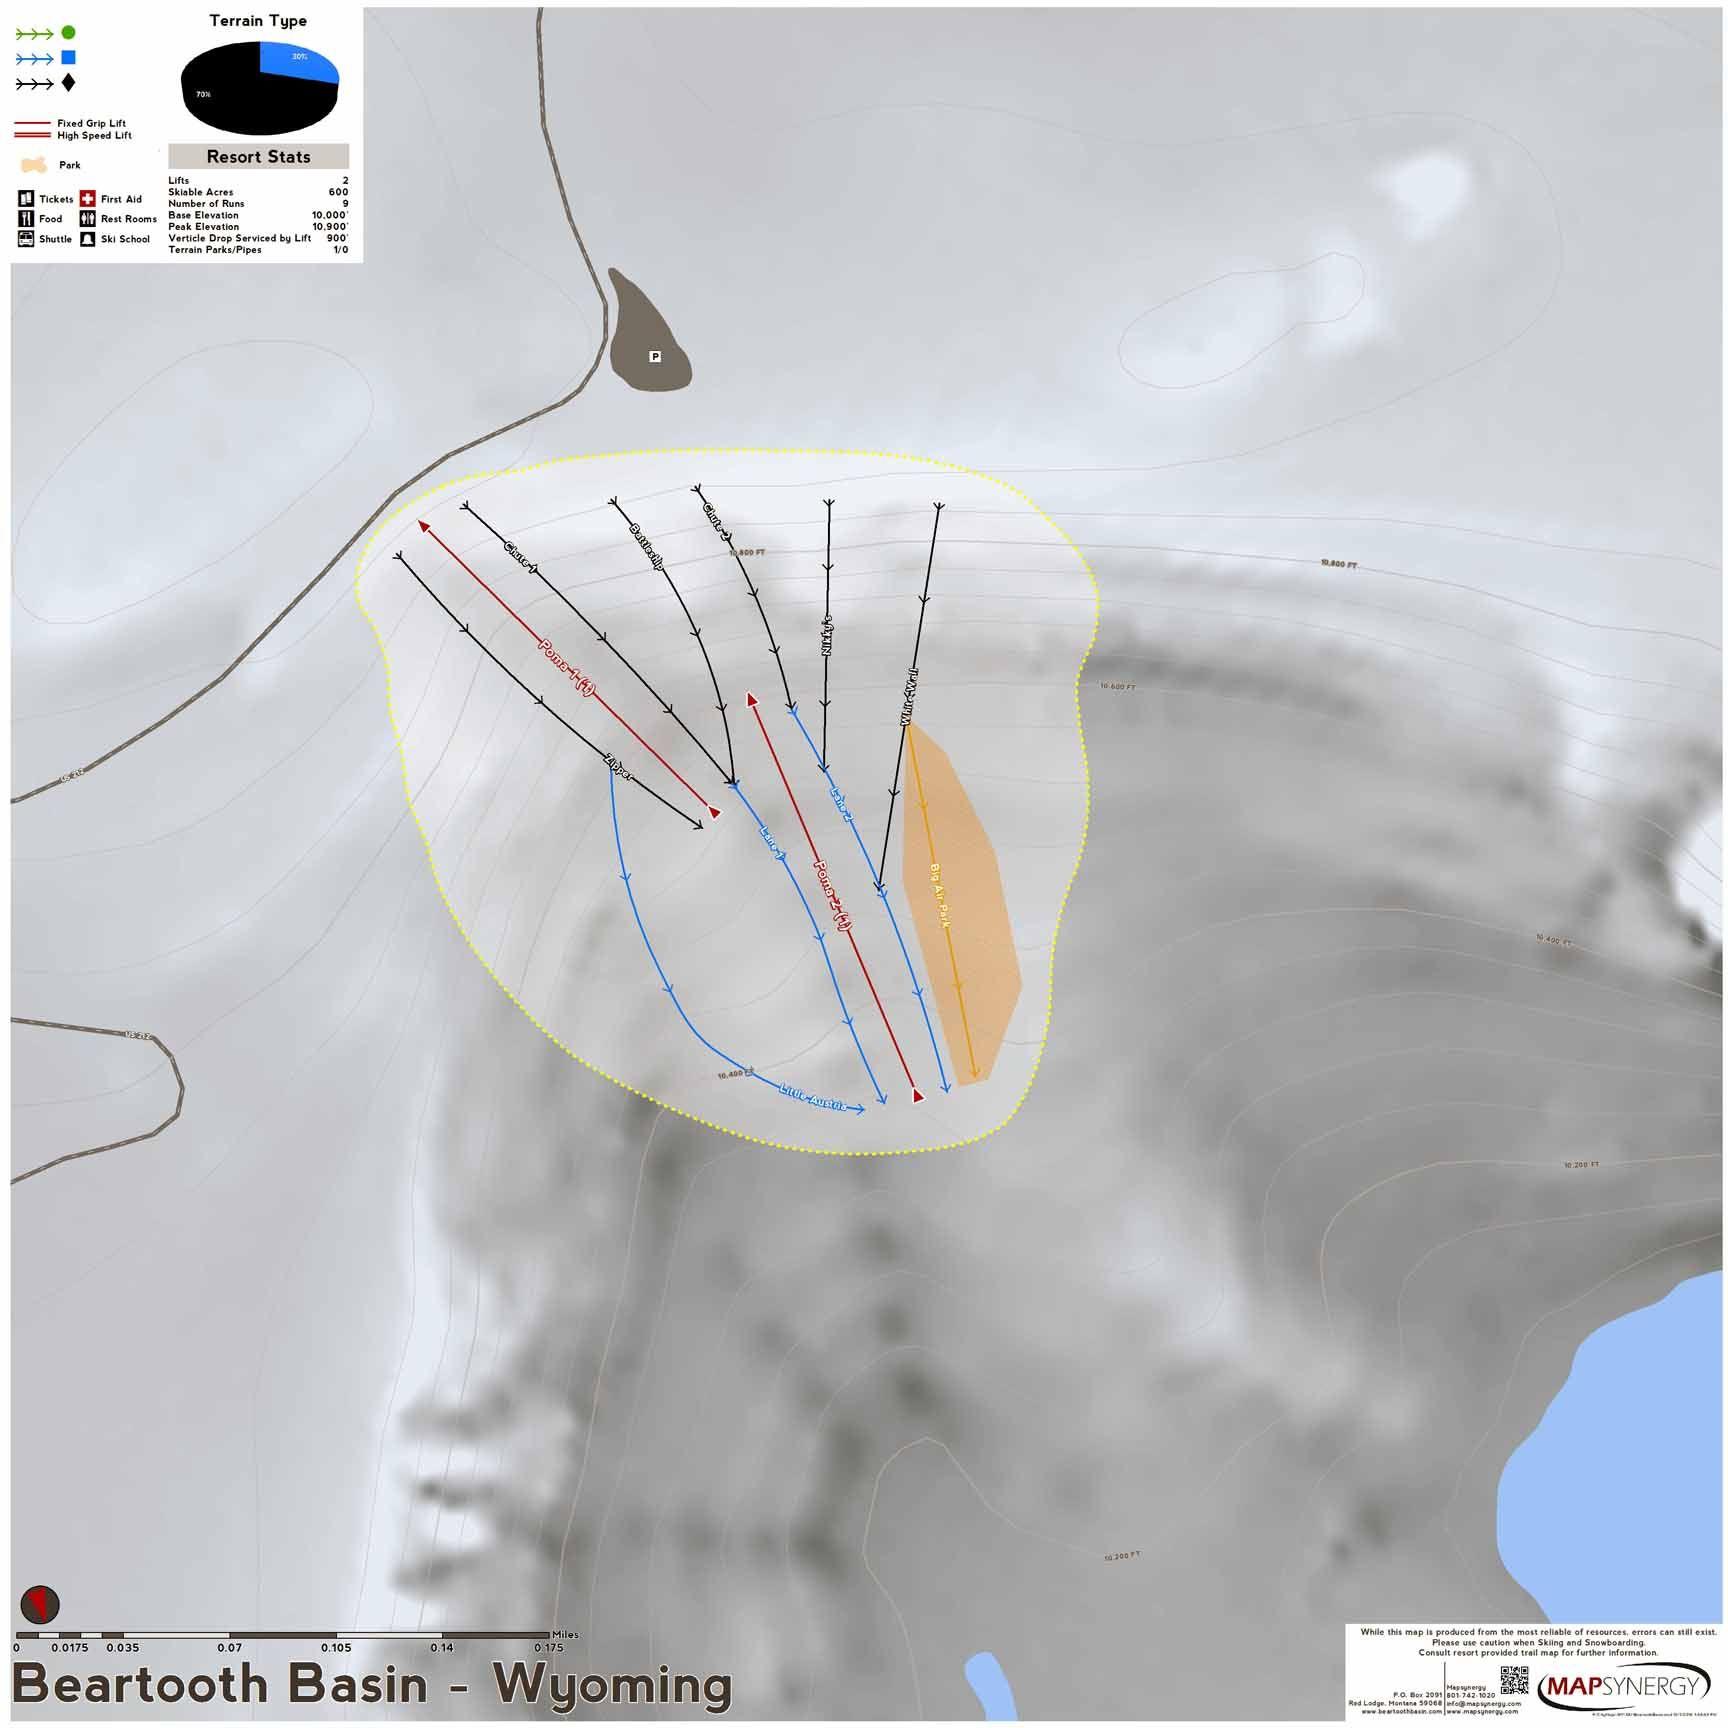 Beartooth Basin ski map | Wyoming Ski Resort Maps | Skiing ... on lakes in wyoming map, skiing near jackson wy, sleeping giant state park trail map, national parks in wyoming map, caves in wyoming map, casinos in wyoming map, rocky mountains in wyoming map, ghost towns in wyoming map, skiing in lake powell, skiing in jackson wyoming, jackson hole ski trail map,